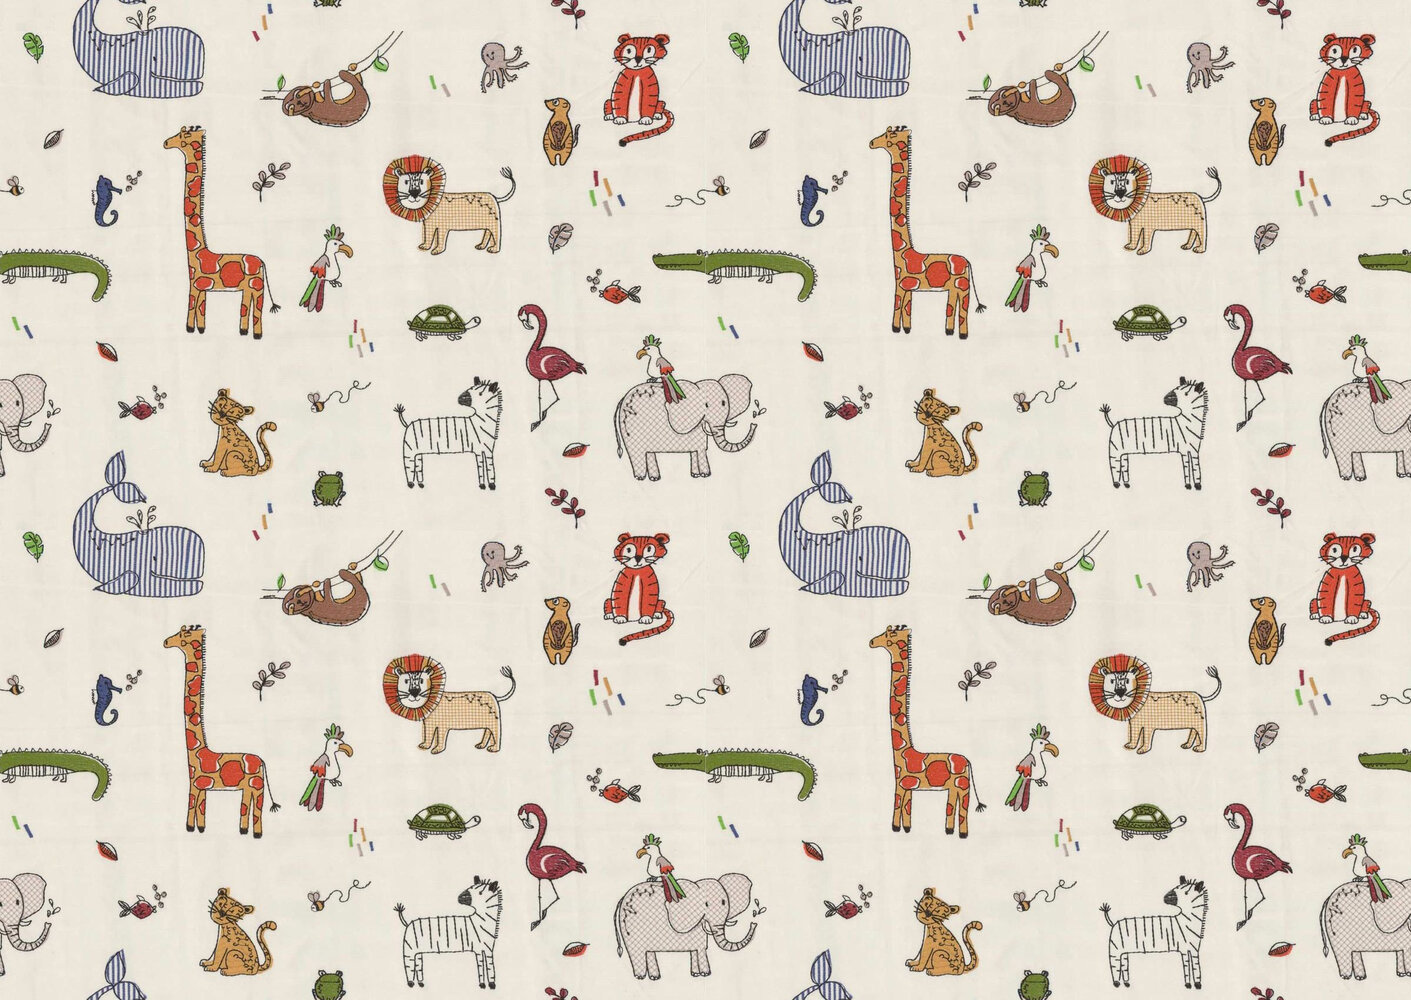 Doodle Fabric - Jungle - by Prestigious